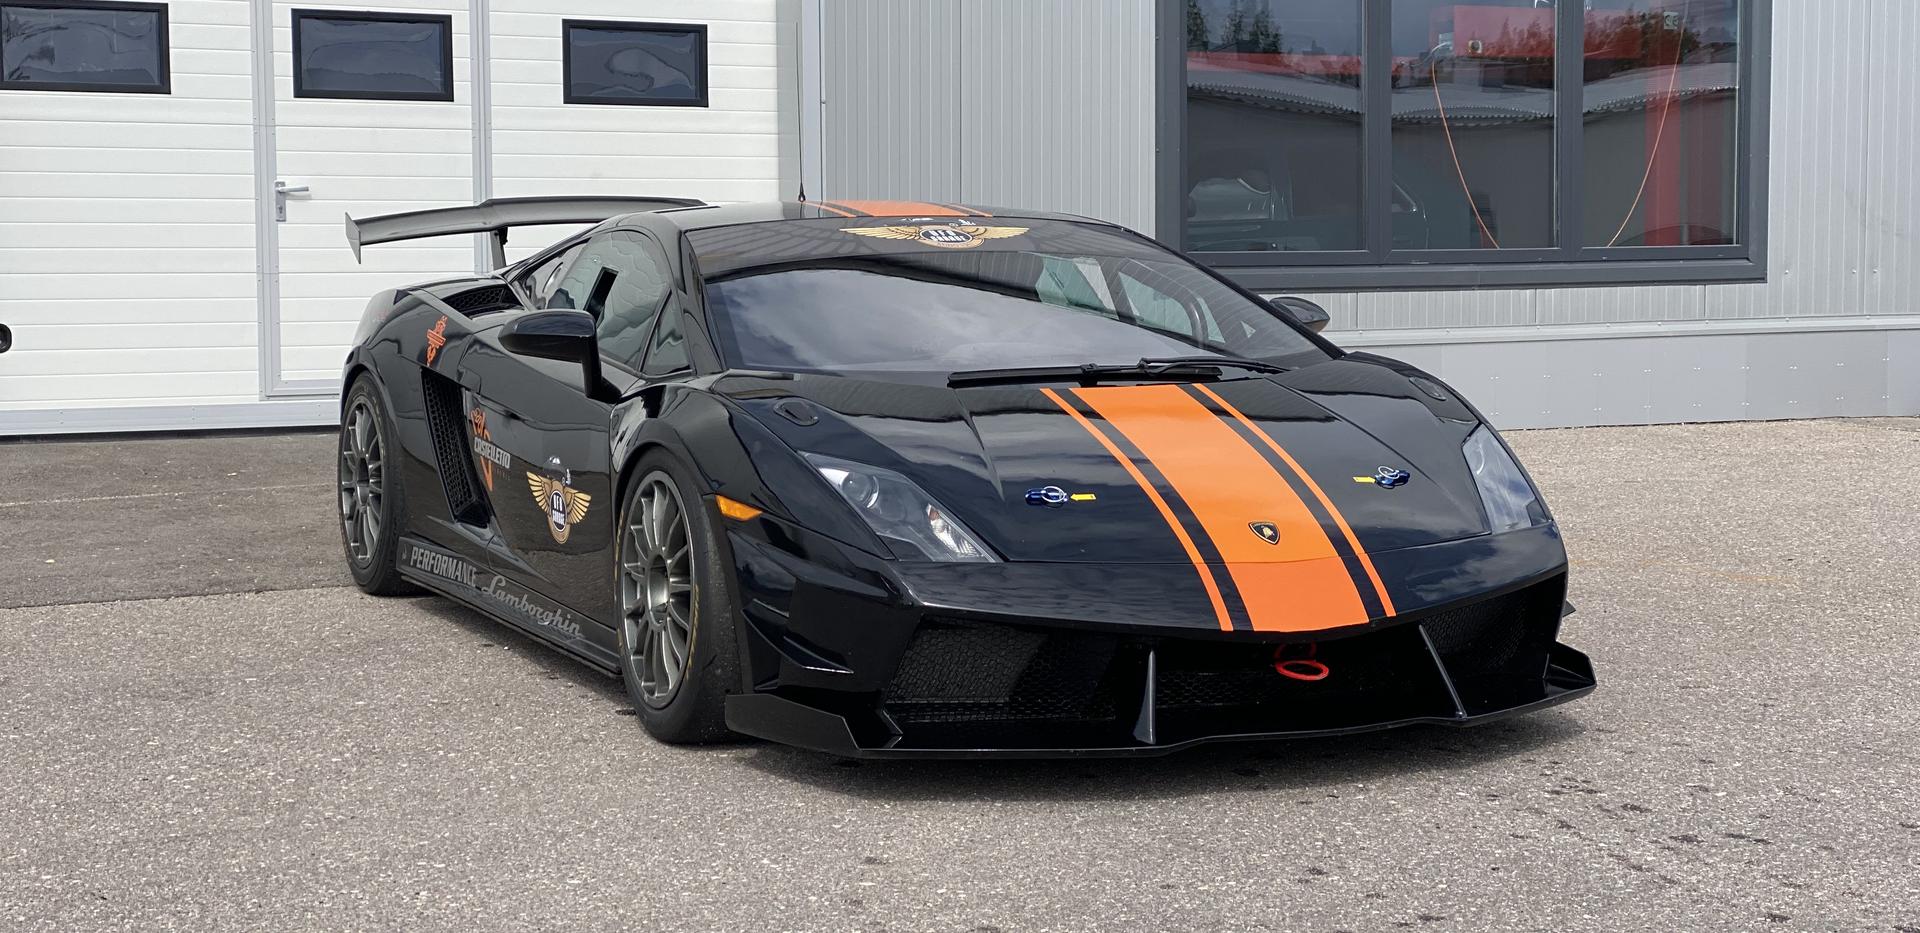 Lamborghini Gallardo Super Trofeo 2011